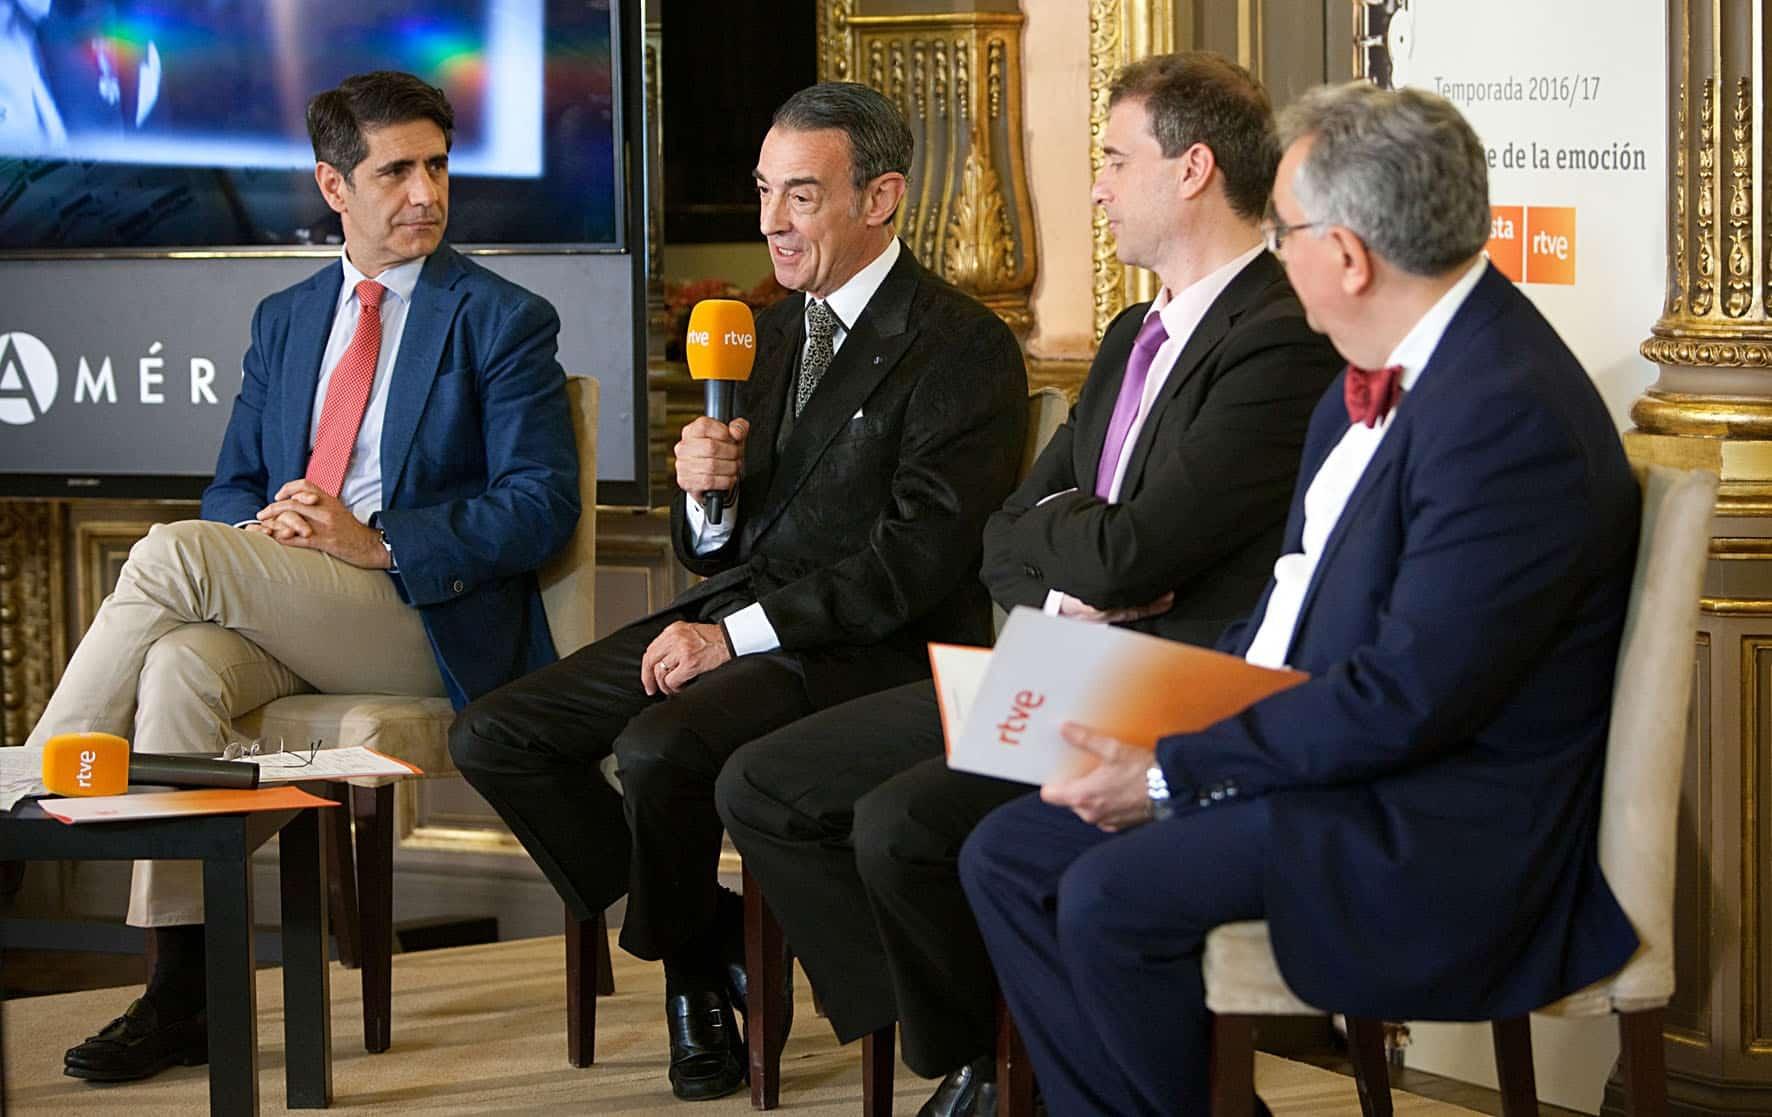 Presentacion de la nueva temporada de la RTVE